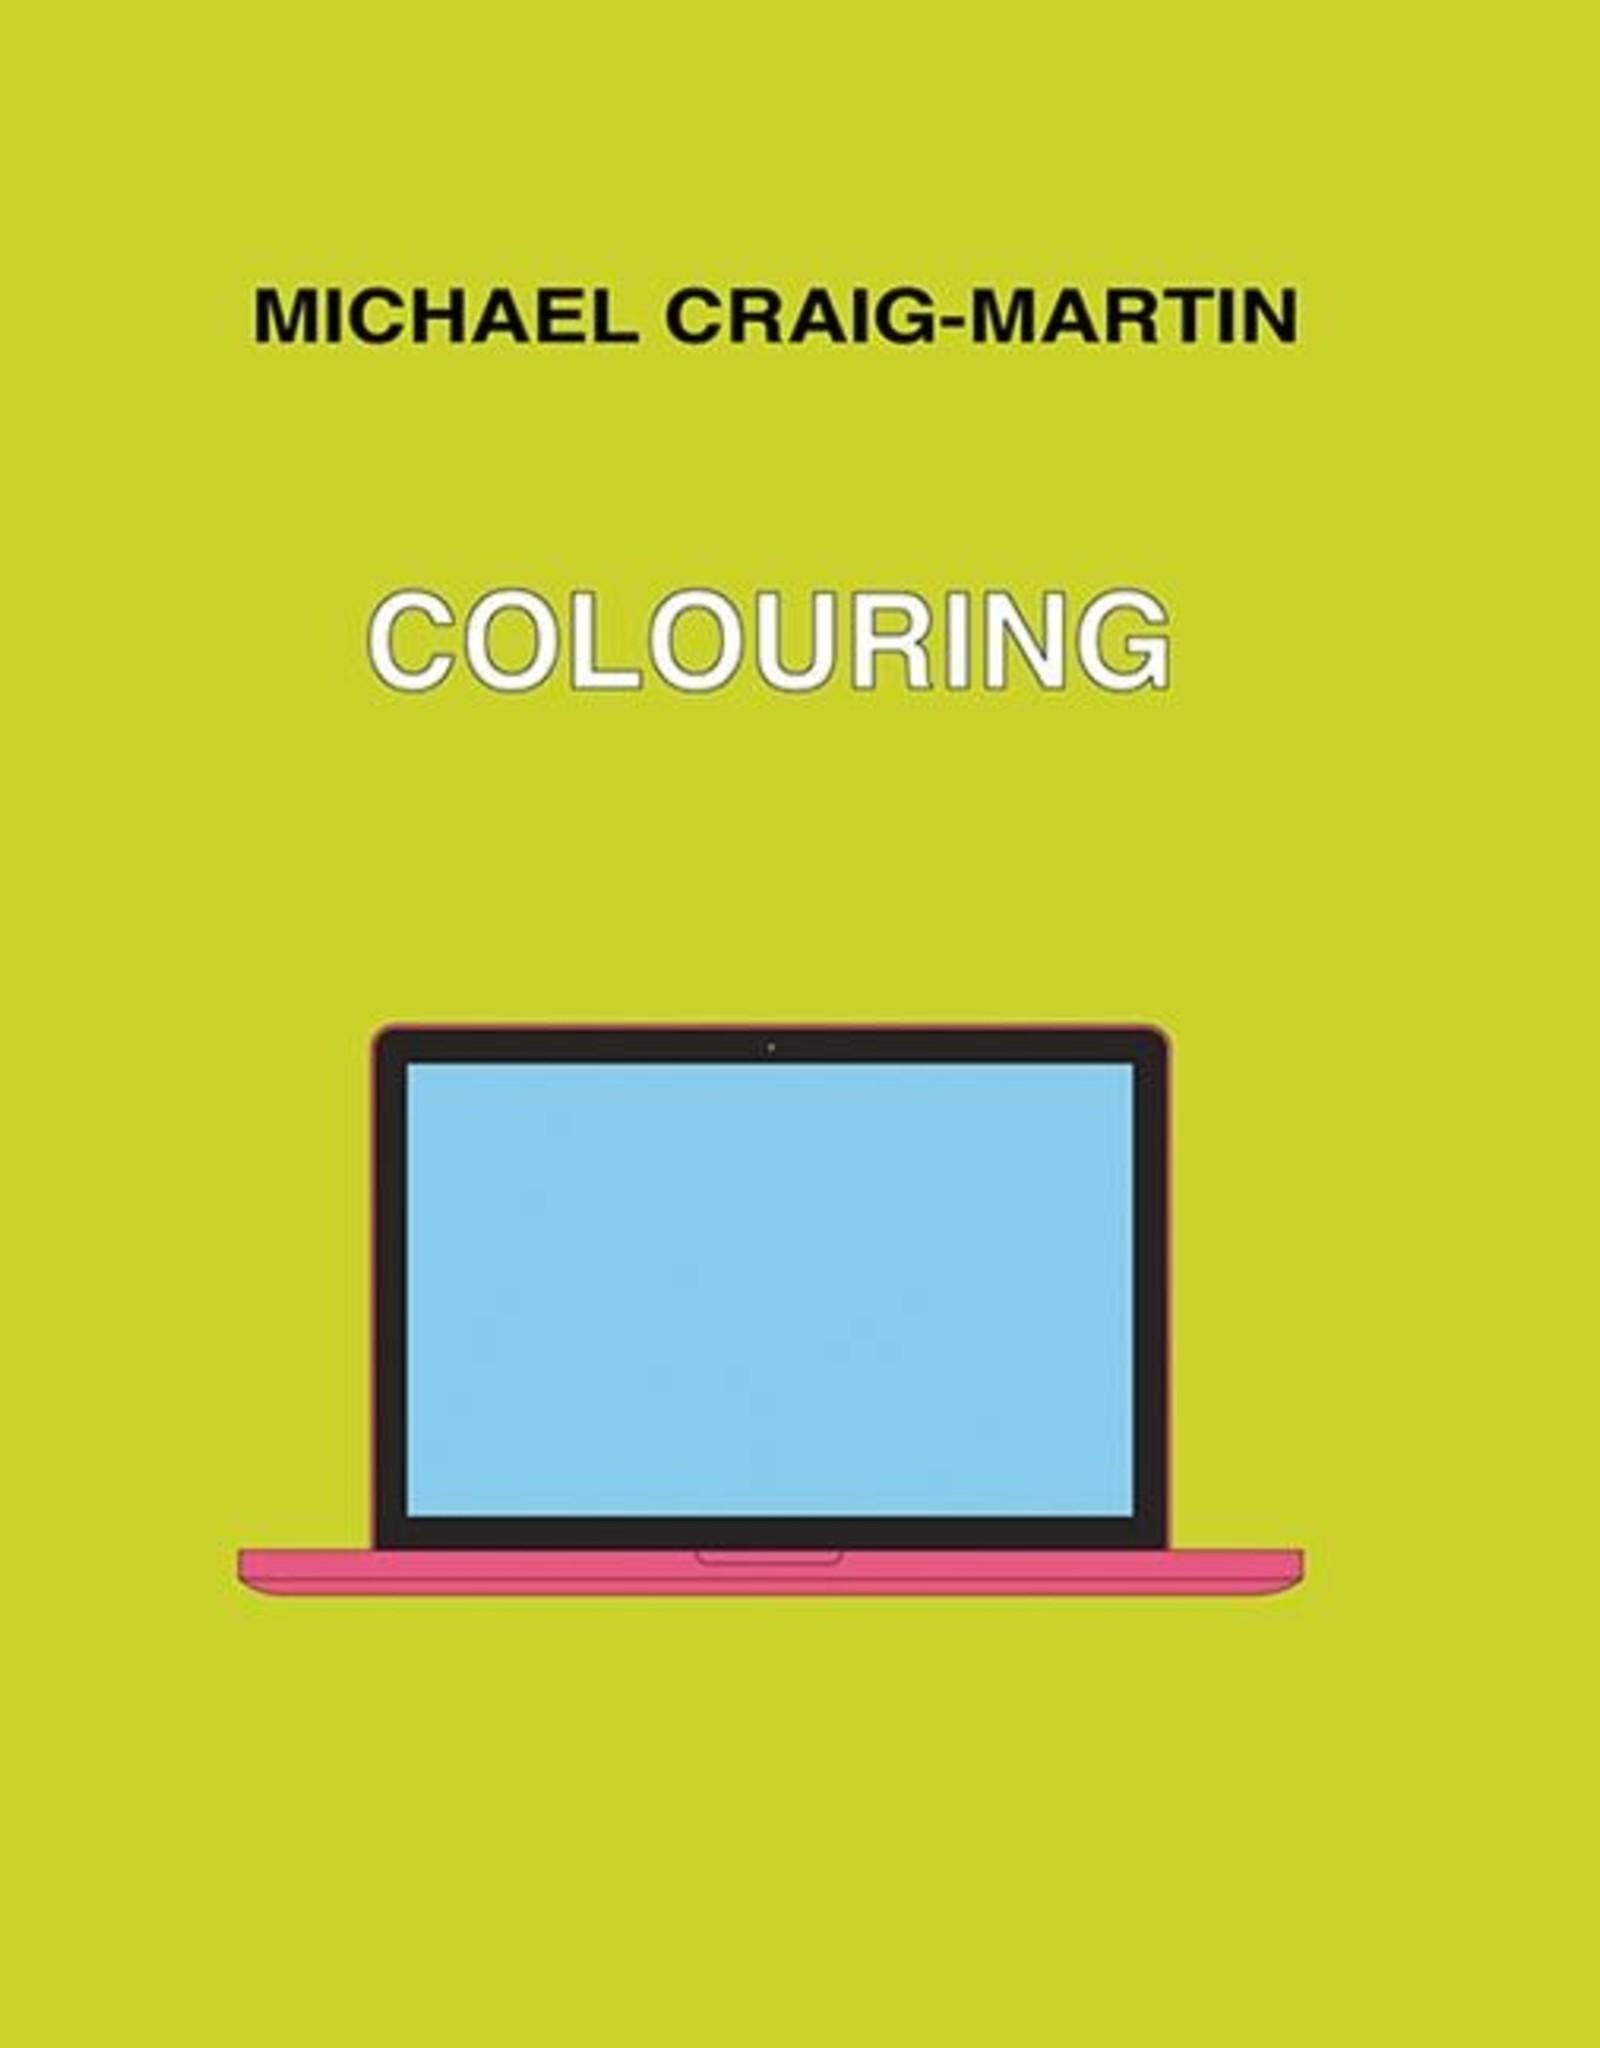 Michael Craig-Martin: Colouring / Michael Craig-Martin